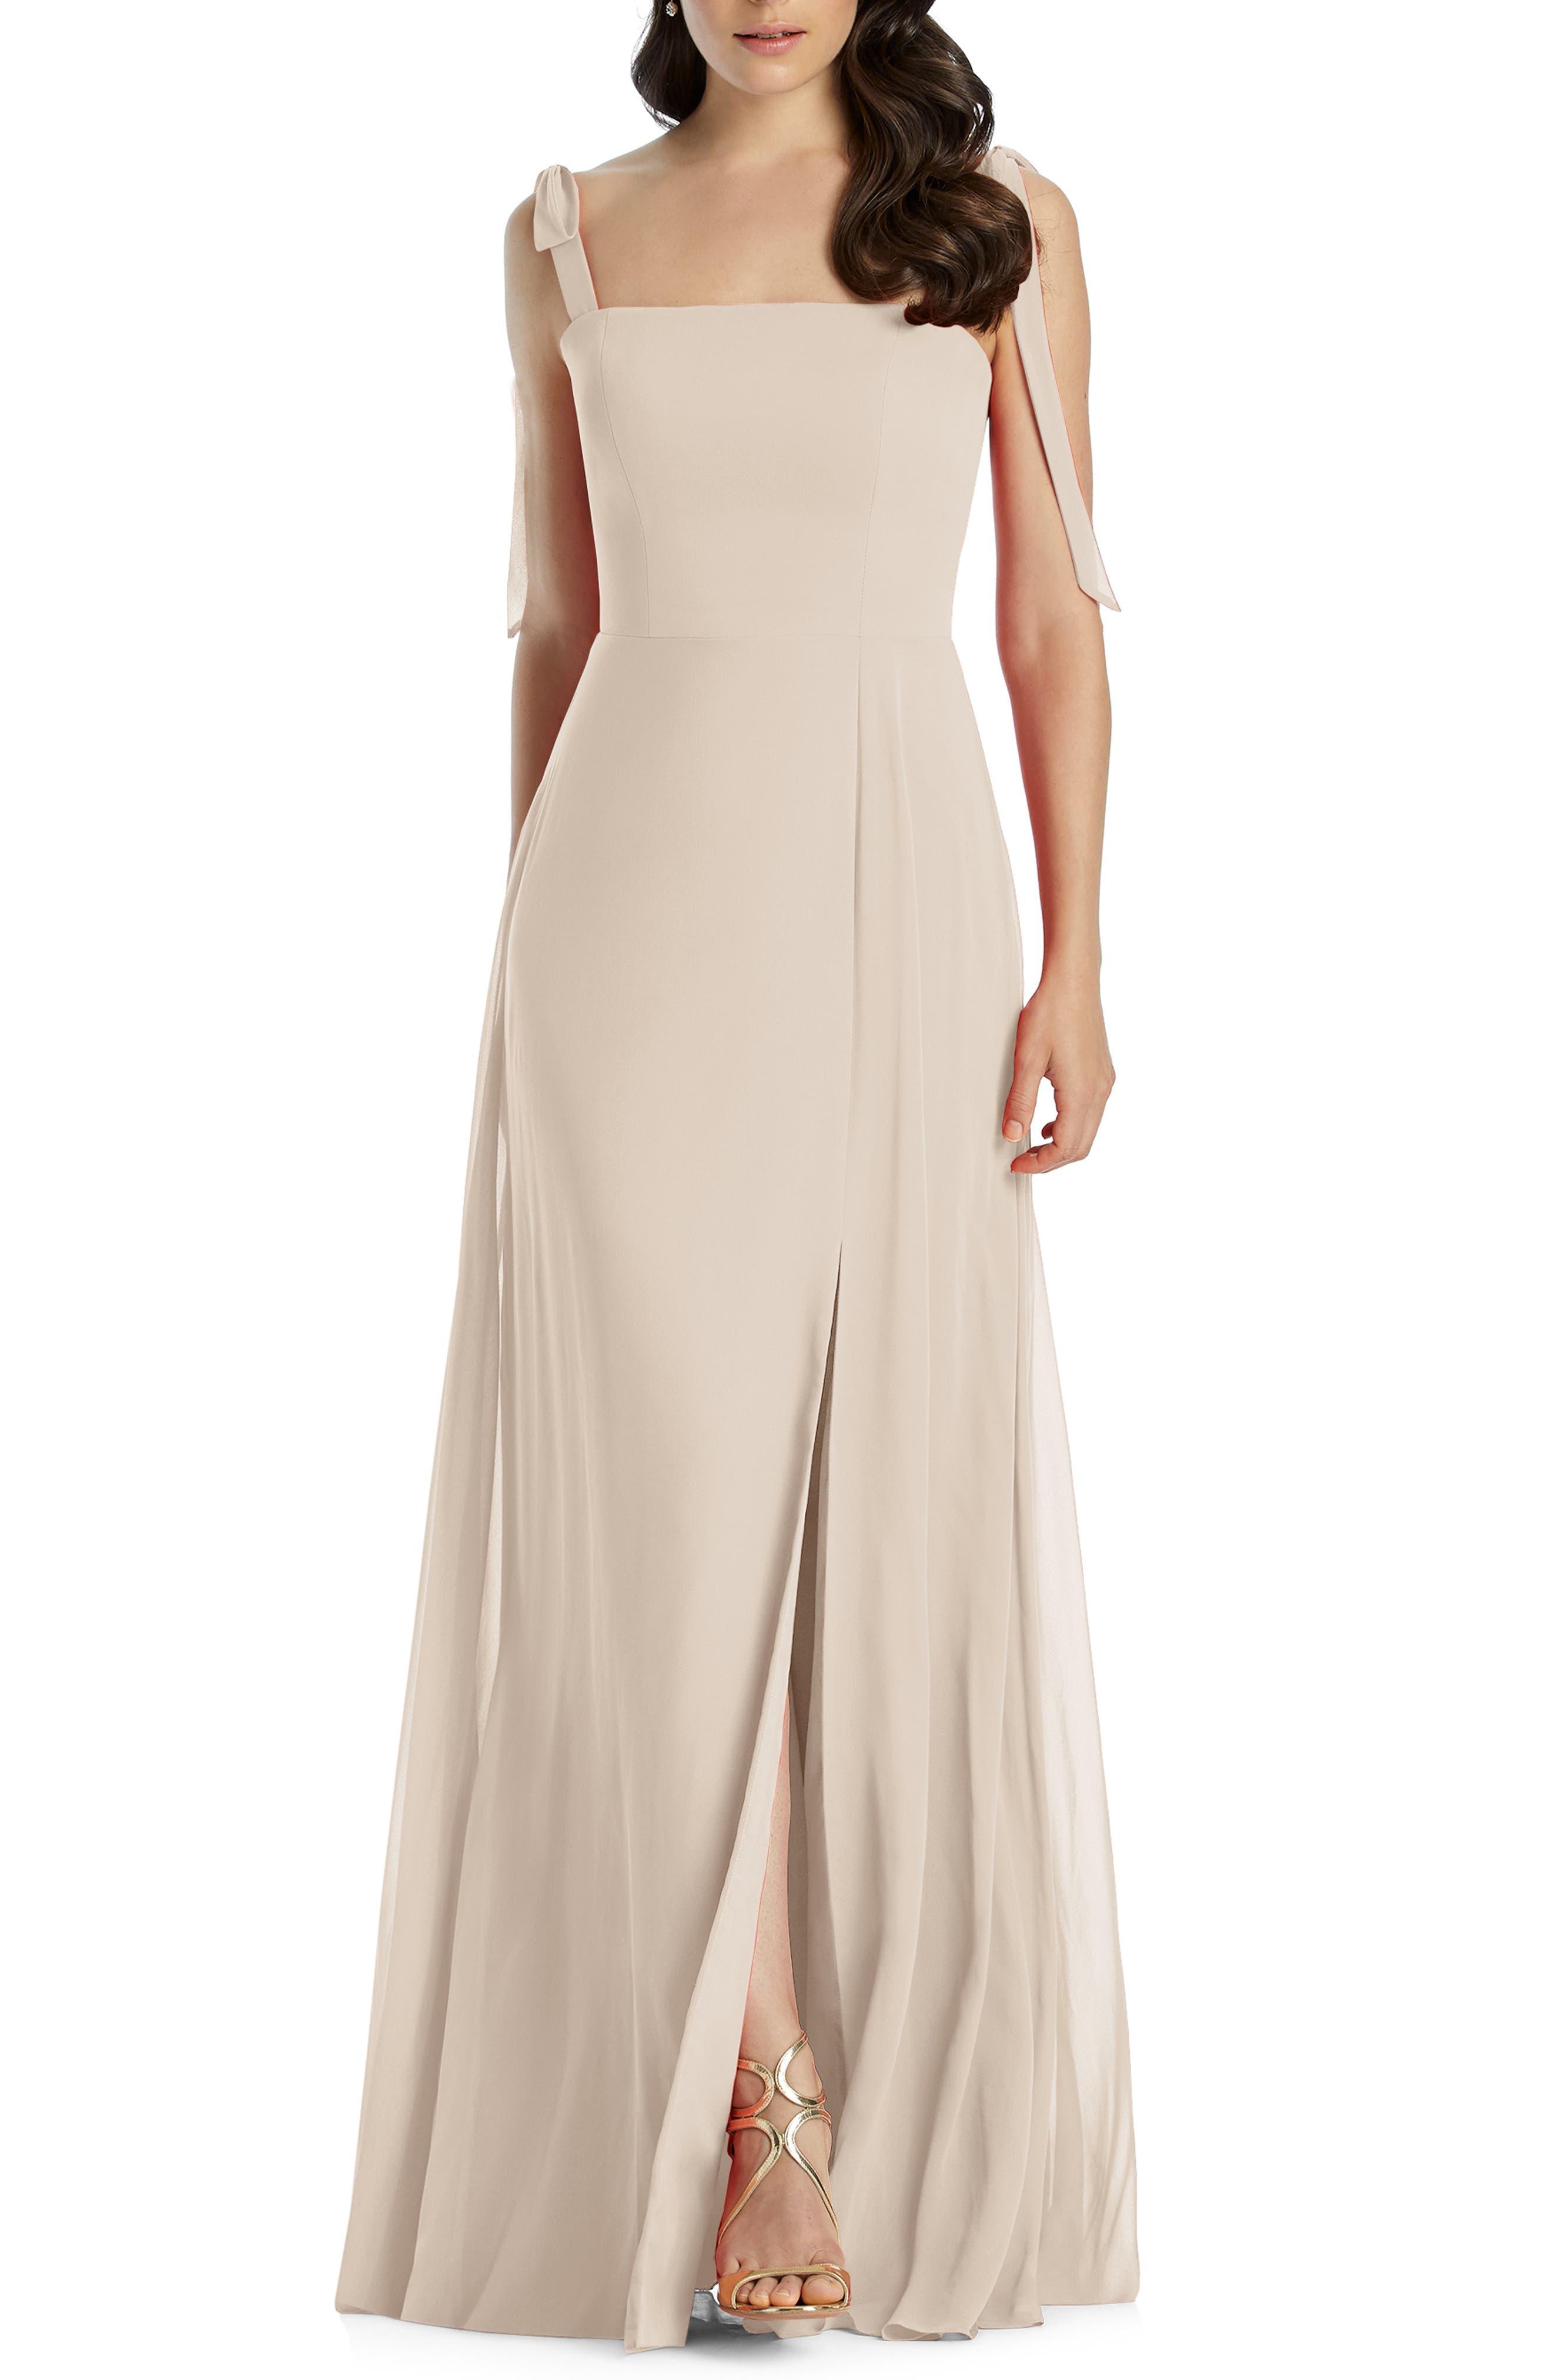 Dessy Collection Shoulder Tie Chiffon Evening Dress, Beige